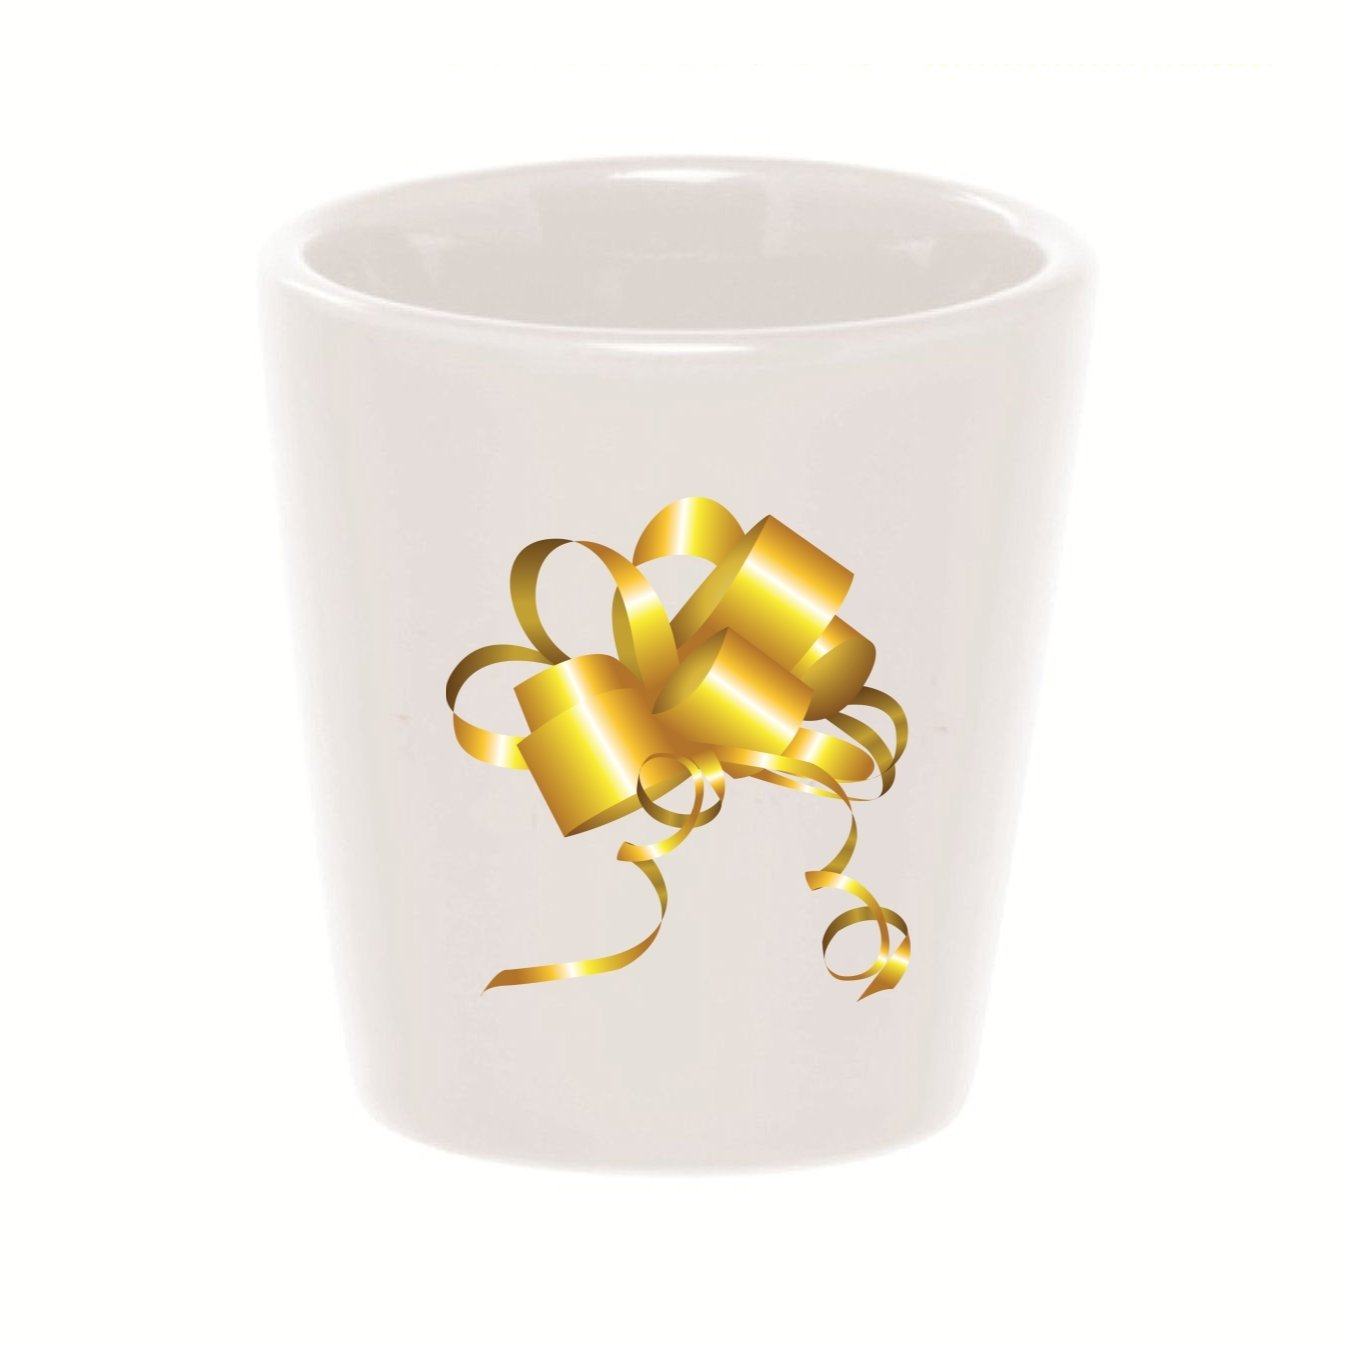 Mashed Mugs Shiny Gold Bow Ceramic Shot Glass bulros t 3d mini mugs